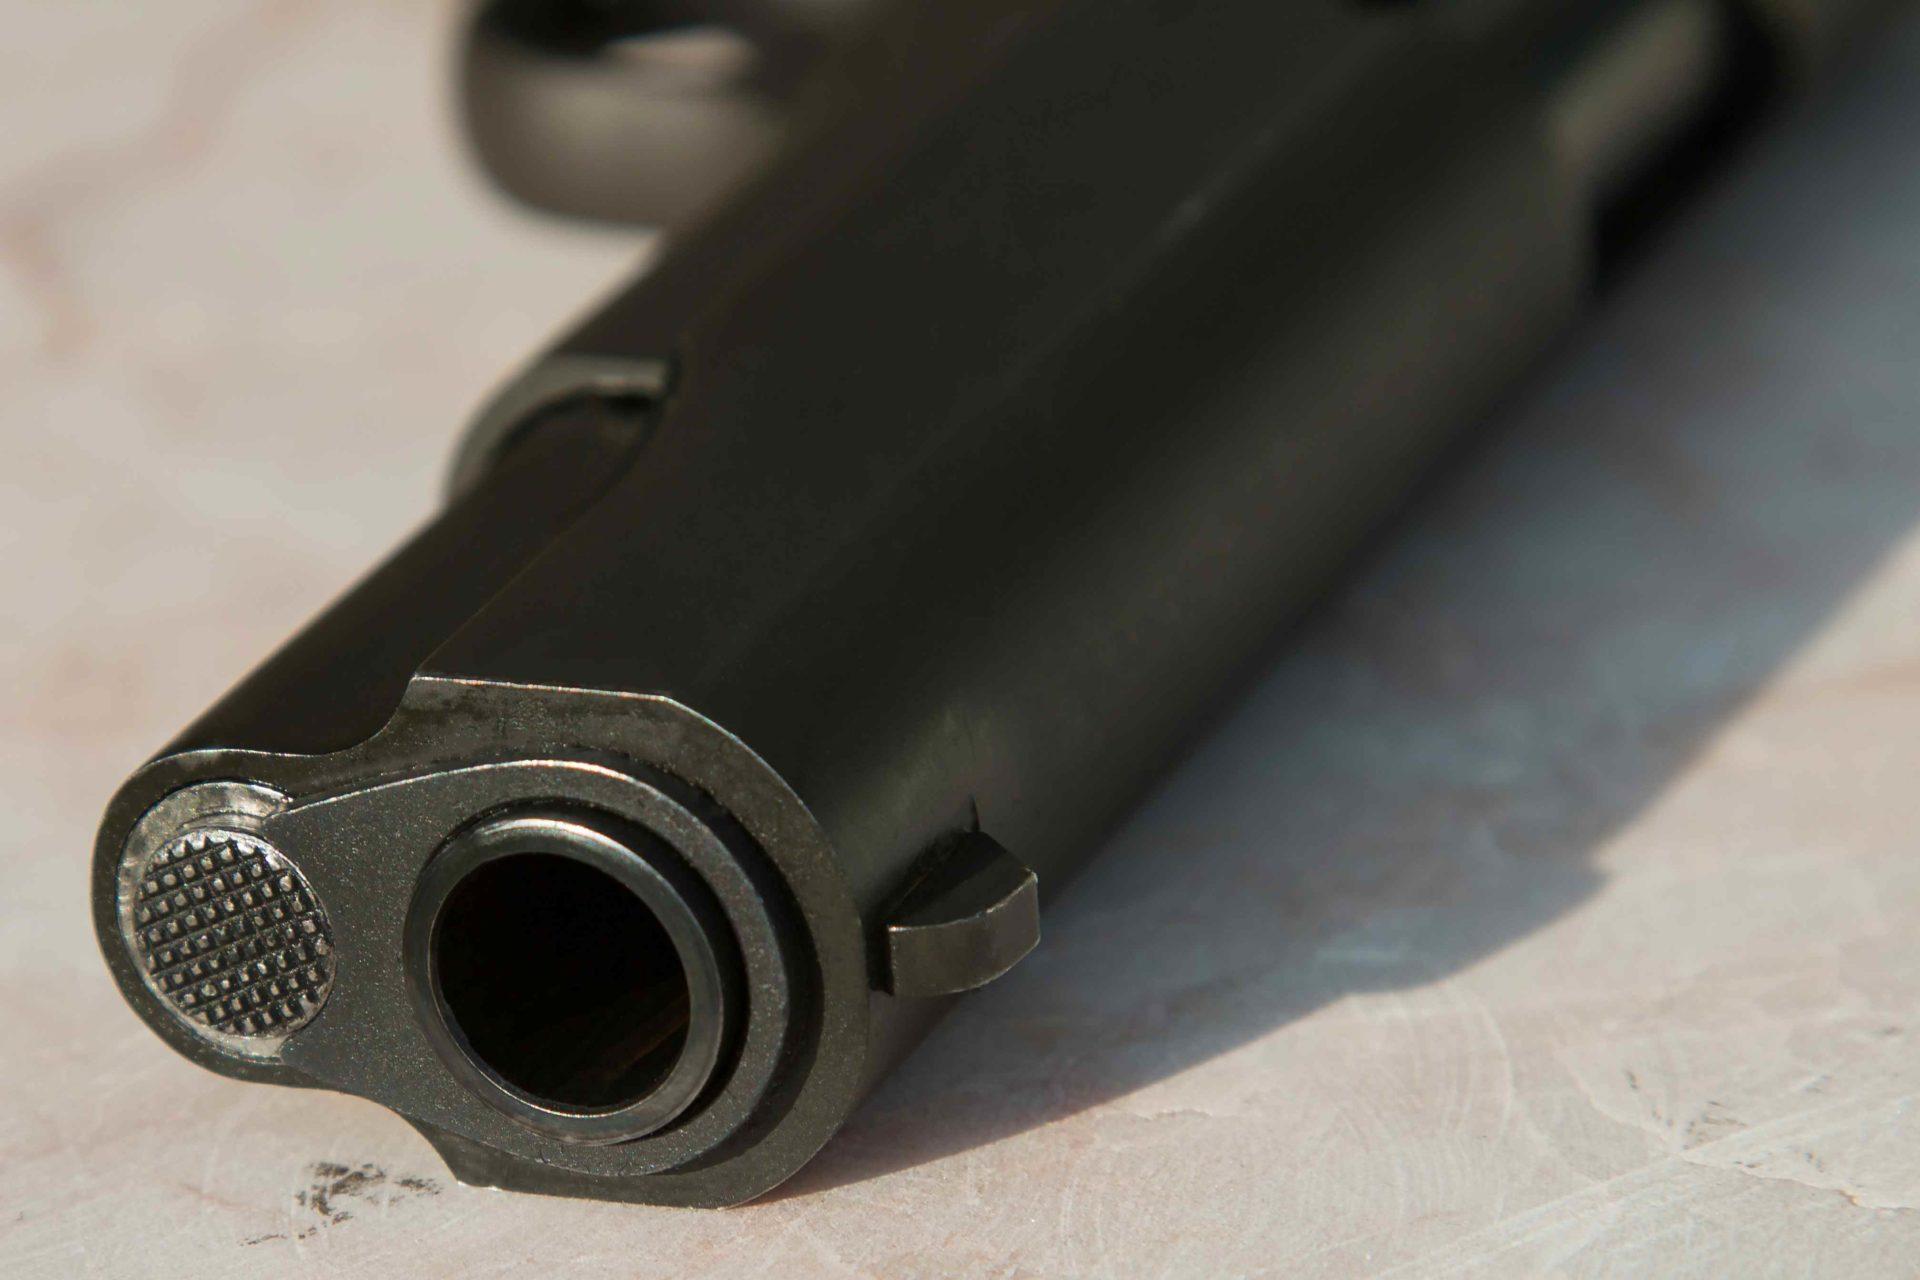 gun croppsed